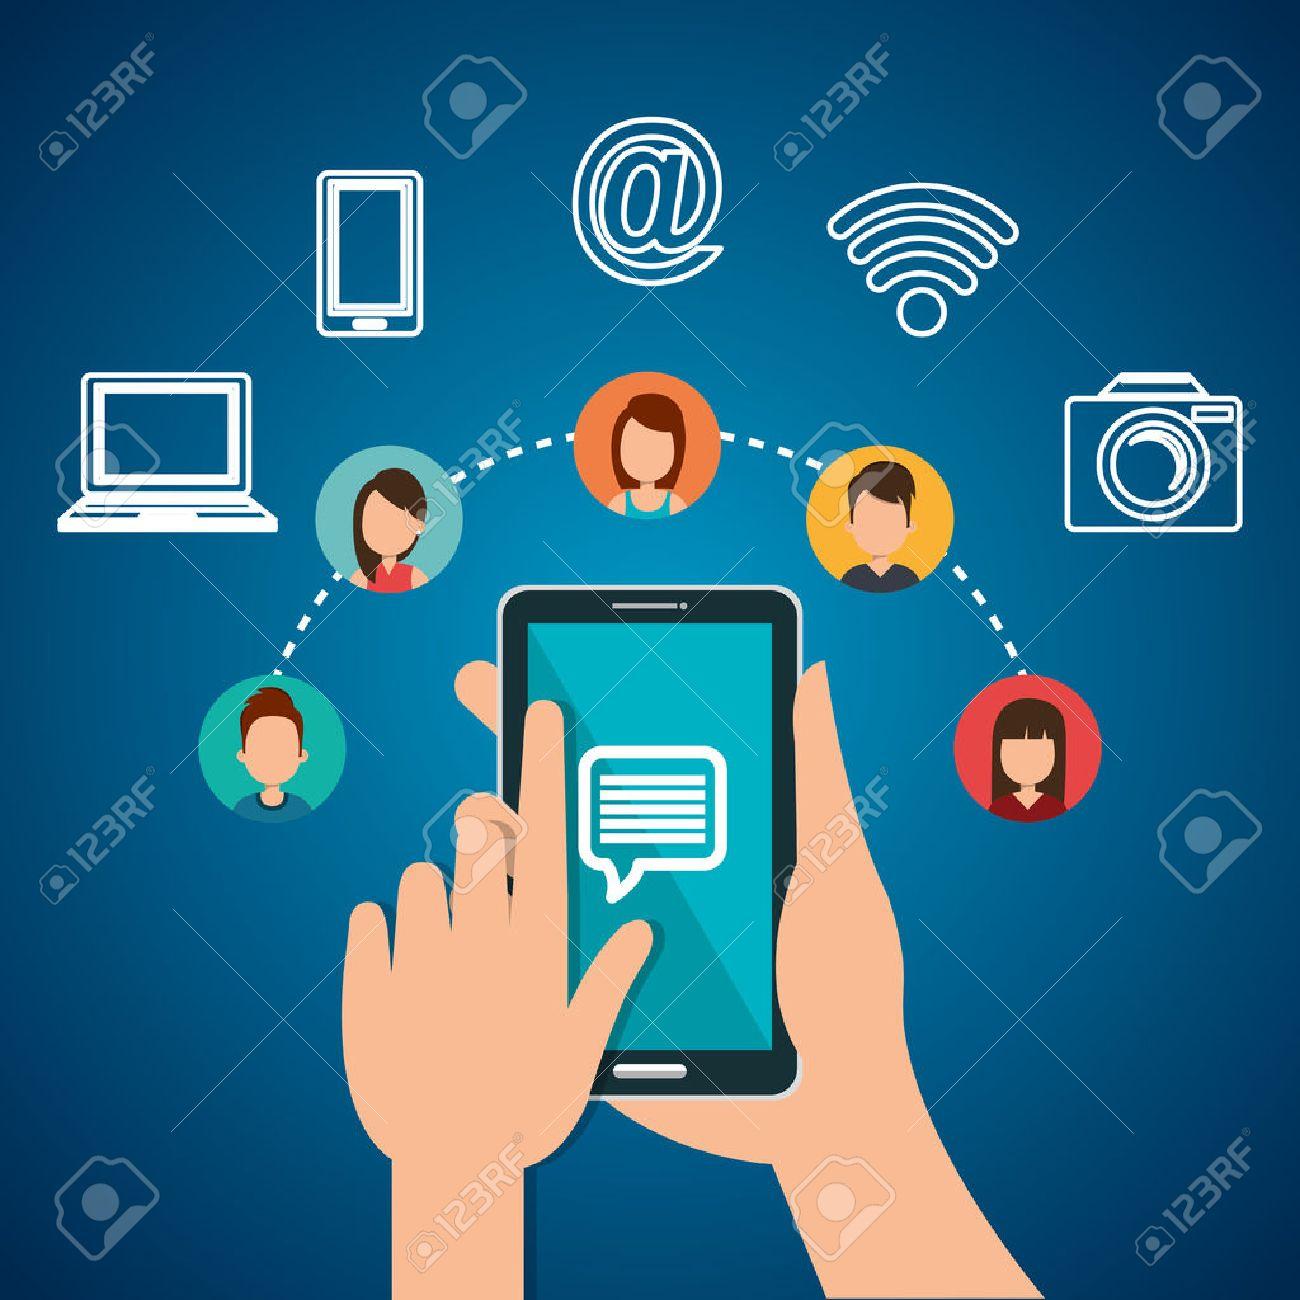 internet communication design, vector illustration eps10 graphic - 58766928